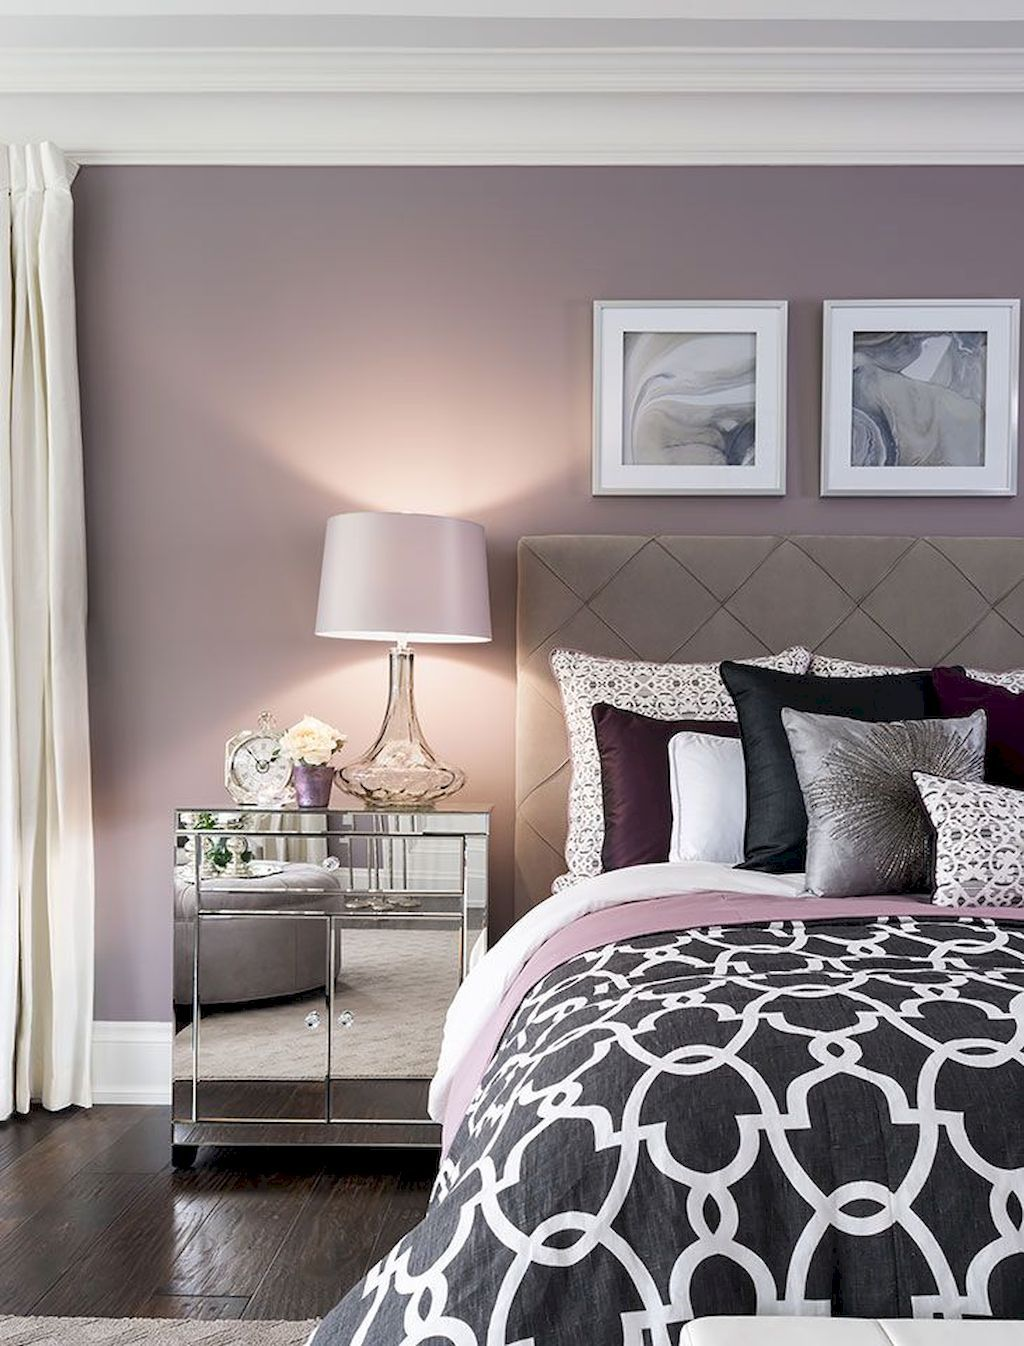 Modern Decor Paint Colors Interior Wall House Bedroom Color Ideas Trendy Style Farmhouse Winnin Small Bedroom Colours Bedroom Wall Colors Bedroom Color Schemes